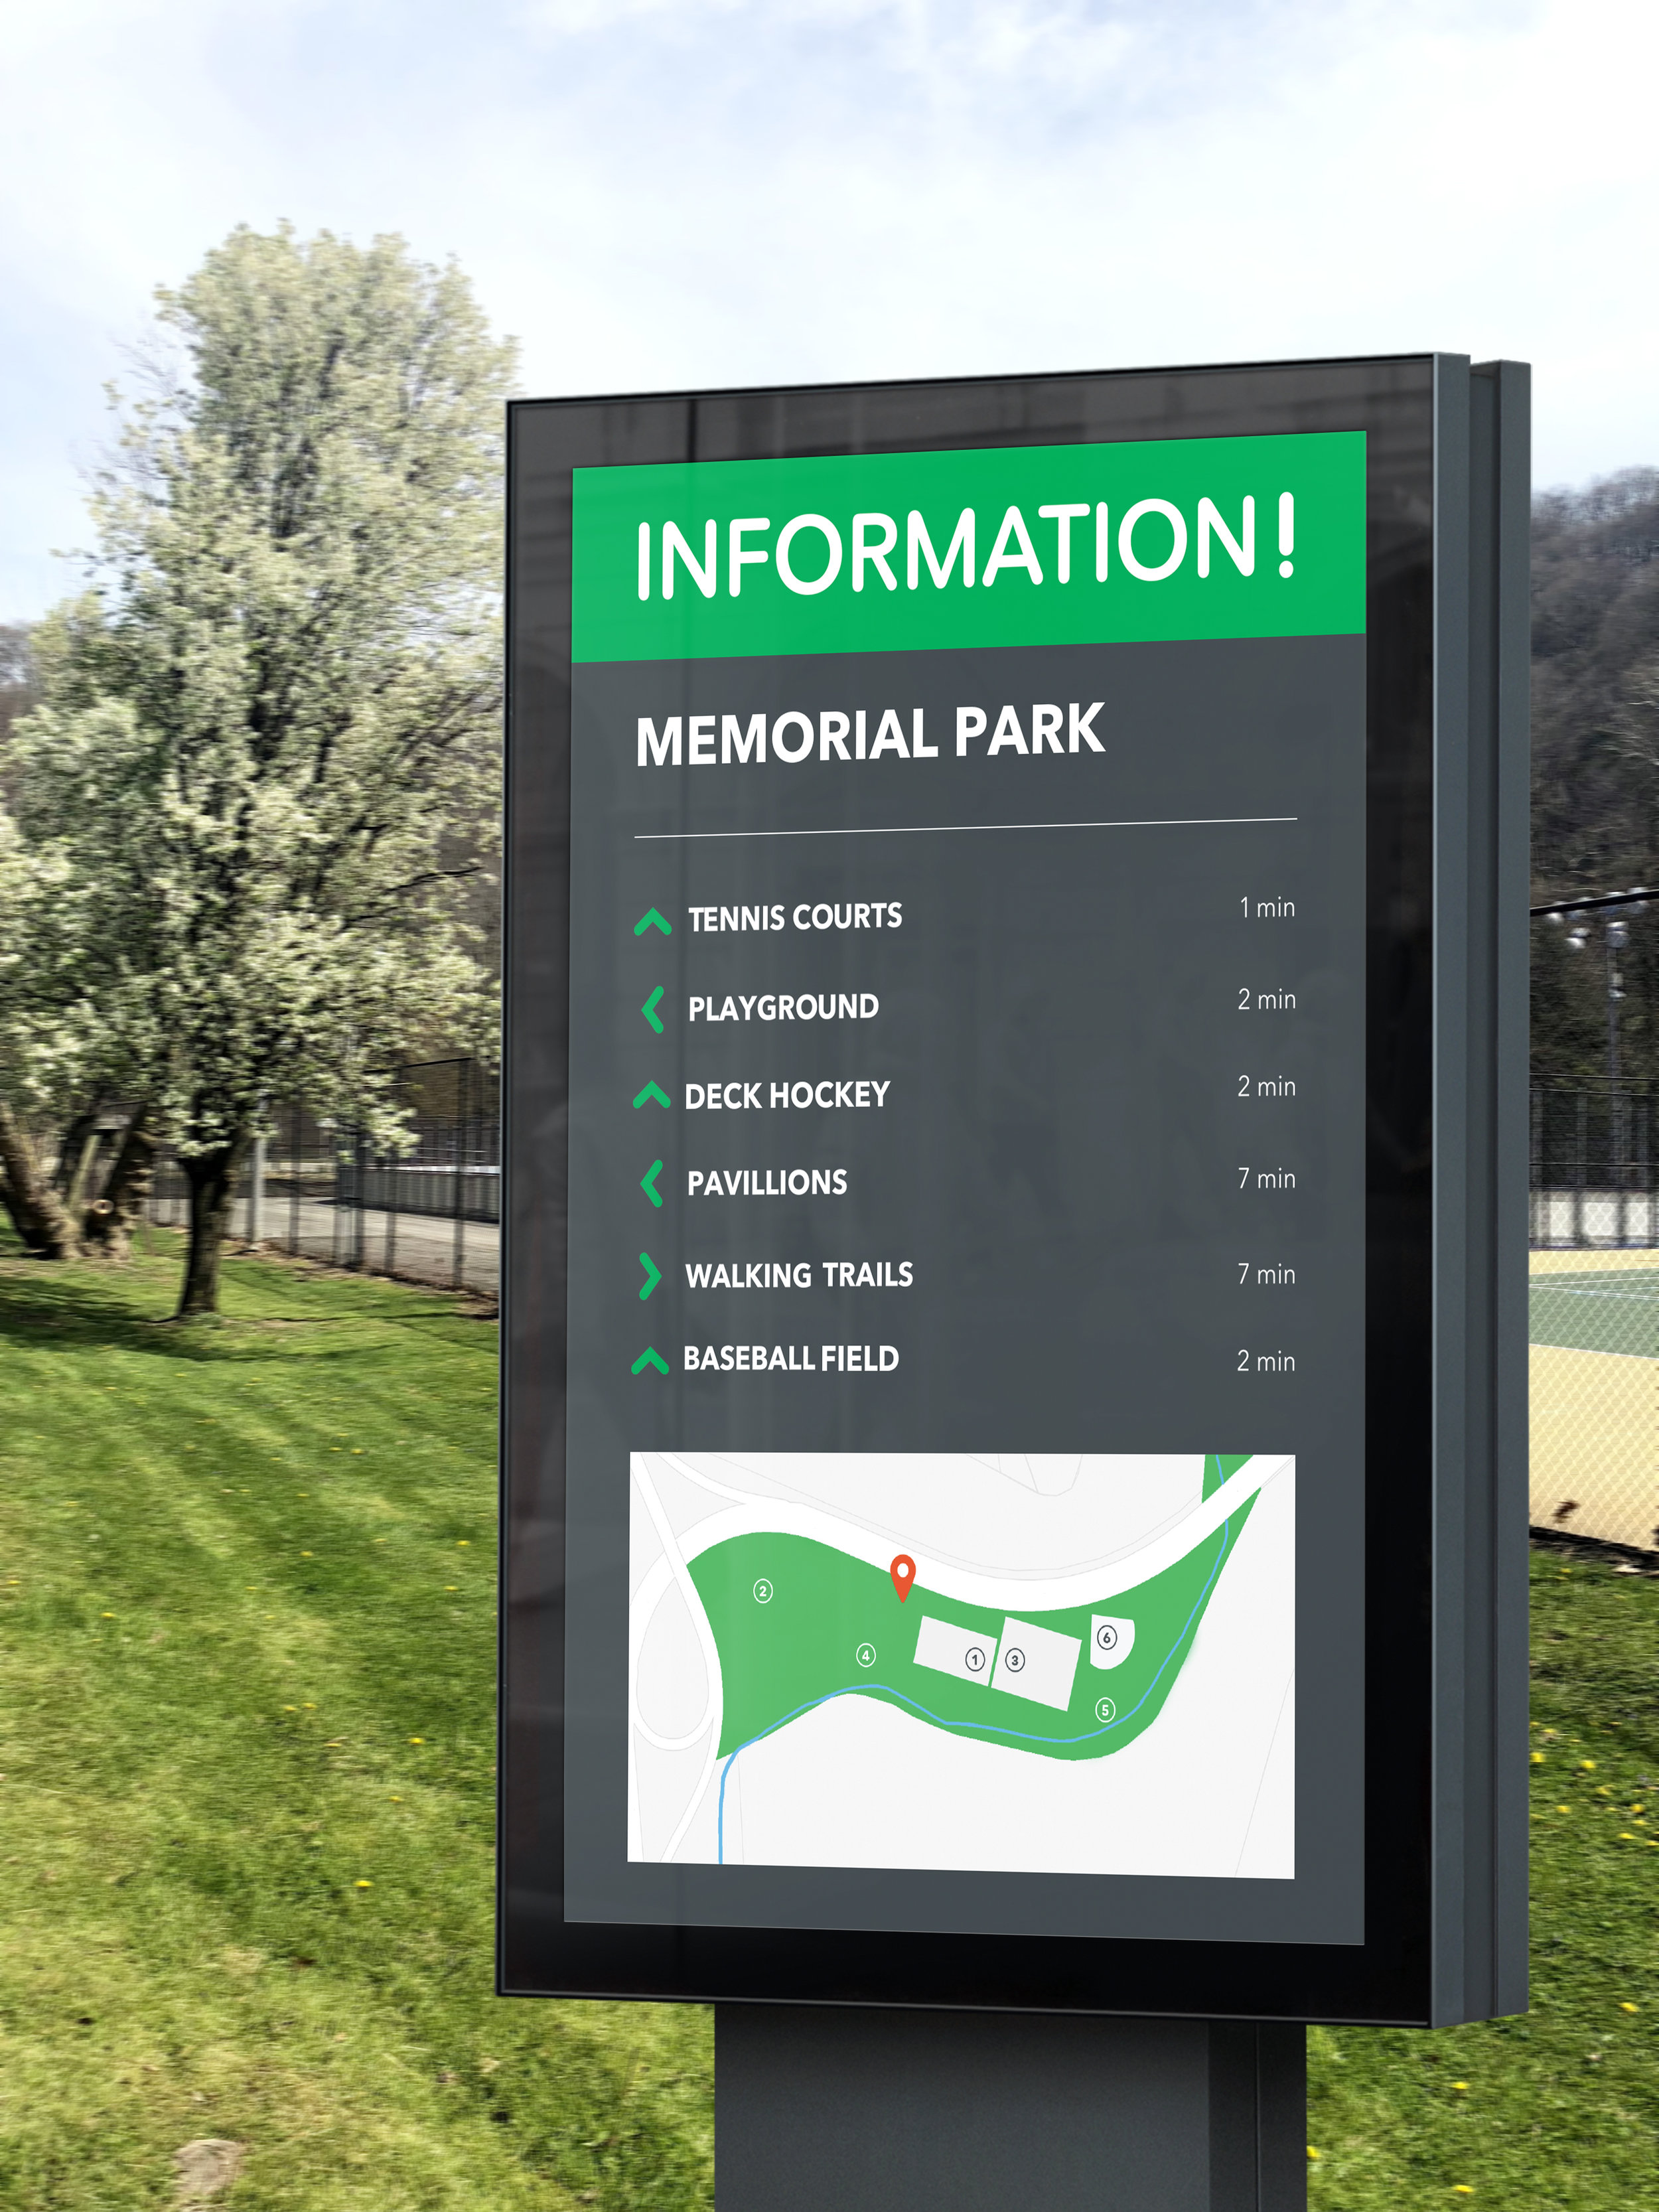 NewKen_ParkSign_Information_Concept1.jpg